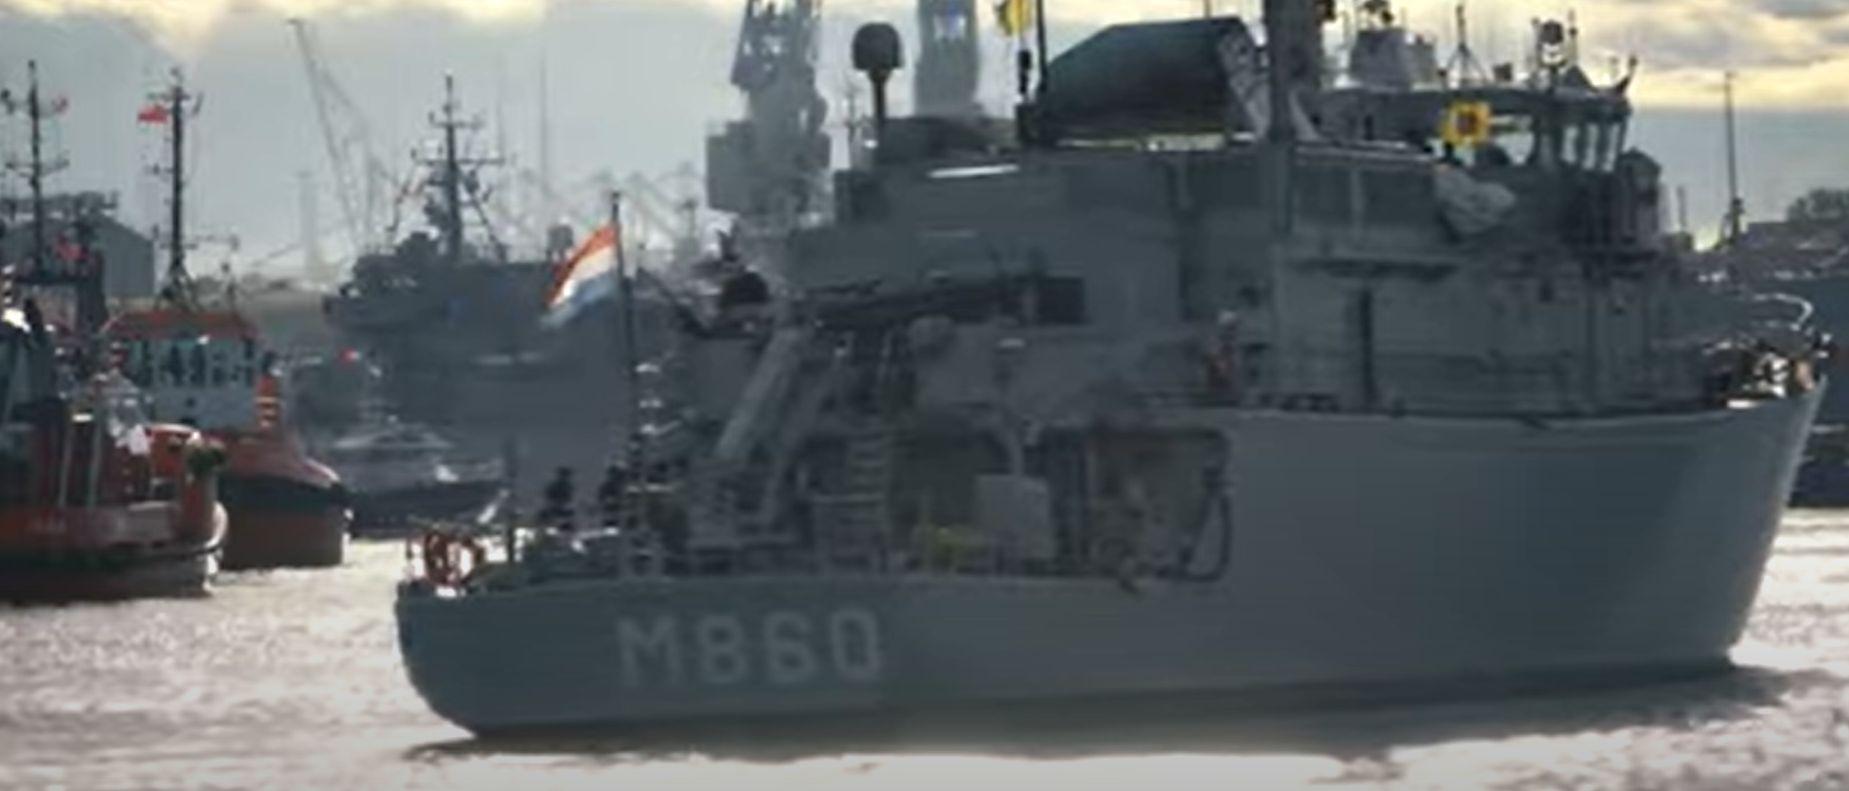 NATO ships at the Port of Gdansk